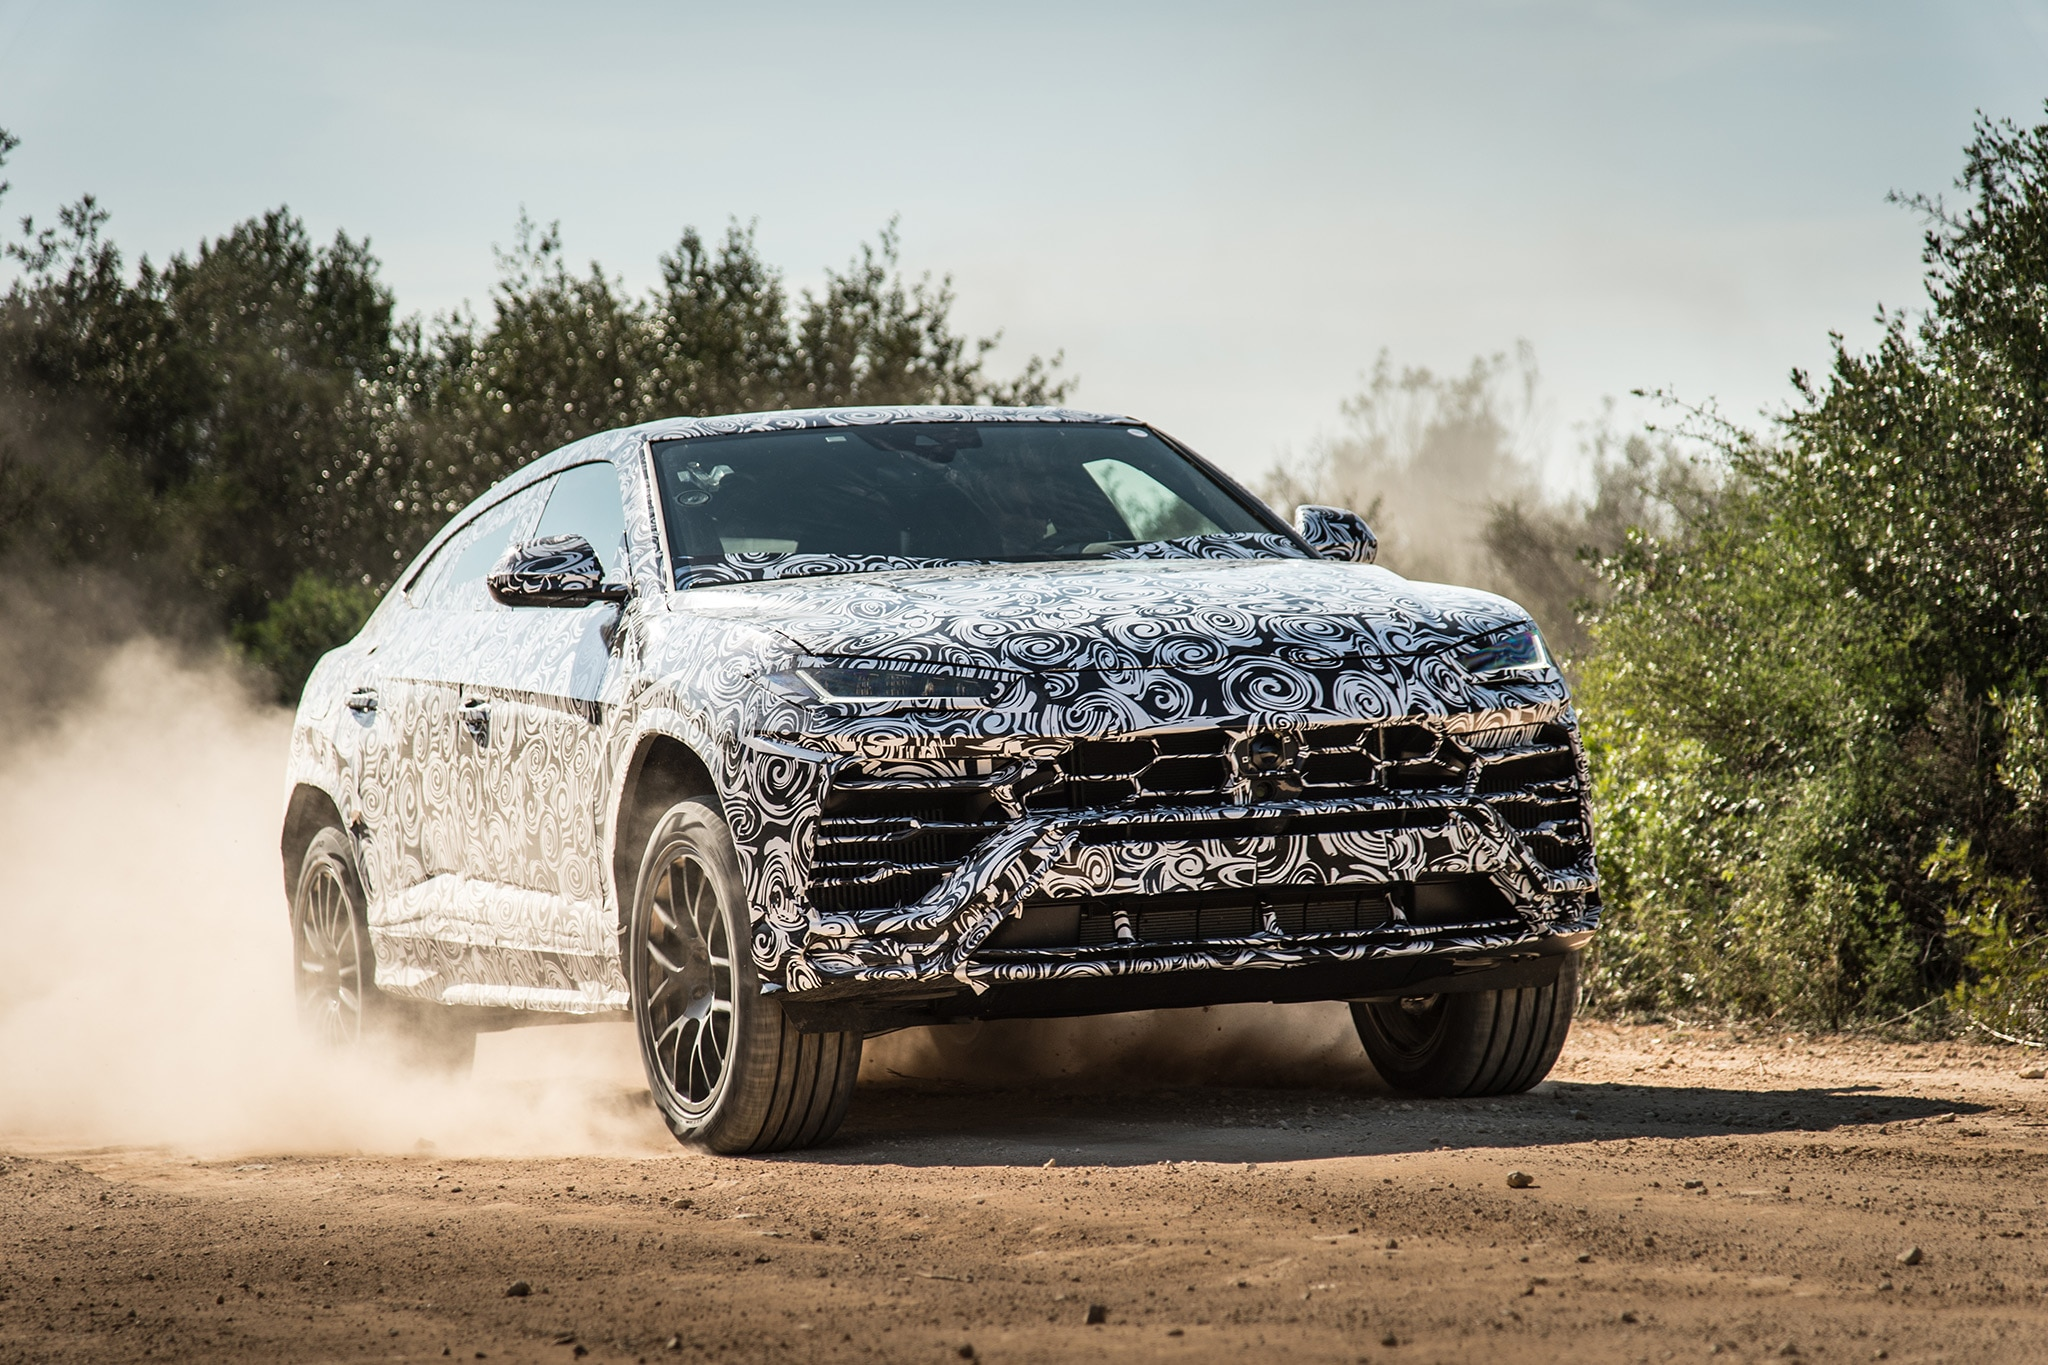 2019 Lamborghini Urus Prototype Nardo 31